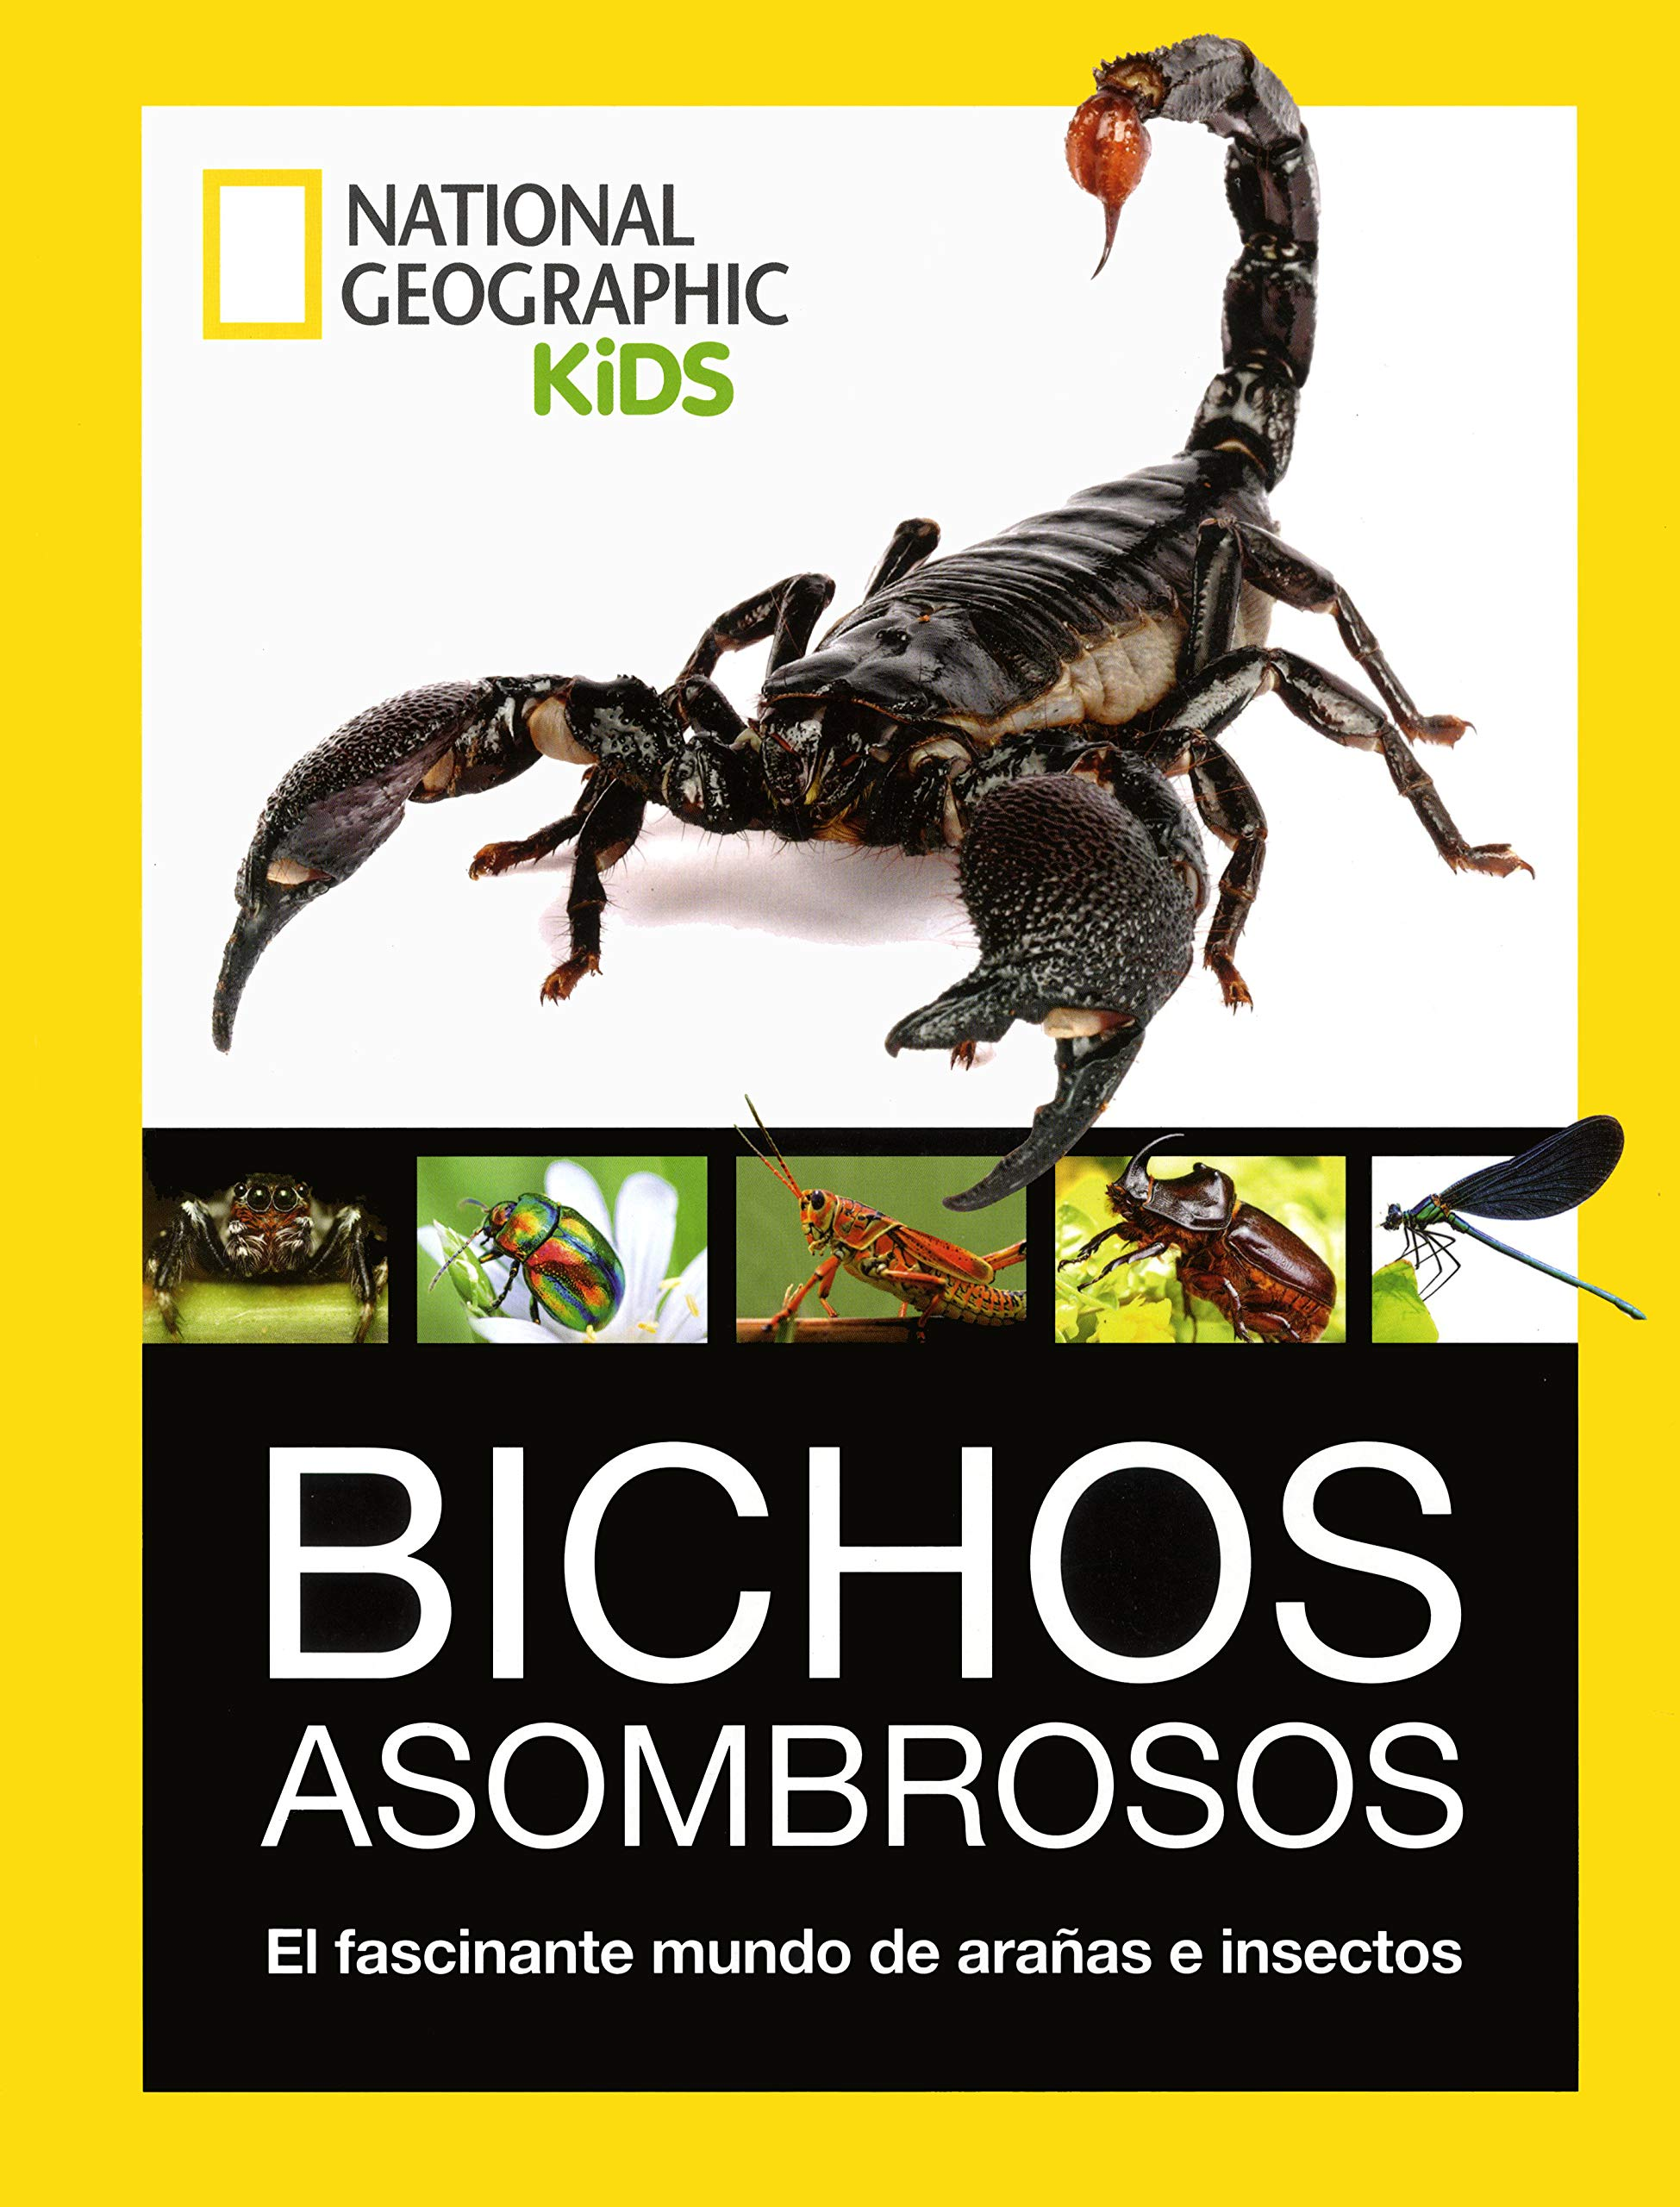 Bichos Asombrosos. El fascinante mundo de arañas e insectos. NG KIDS: Amazon.es: Vv.Aa.: Libros